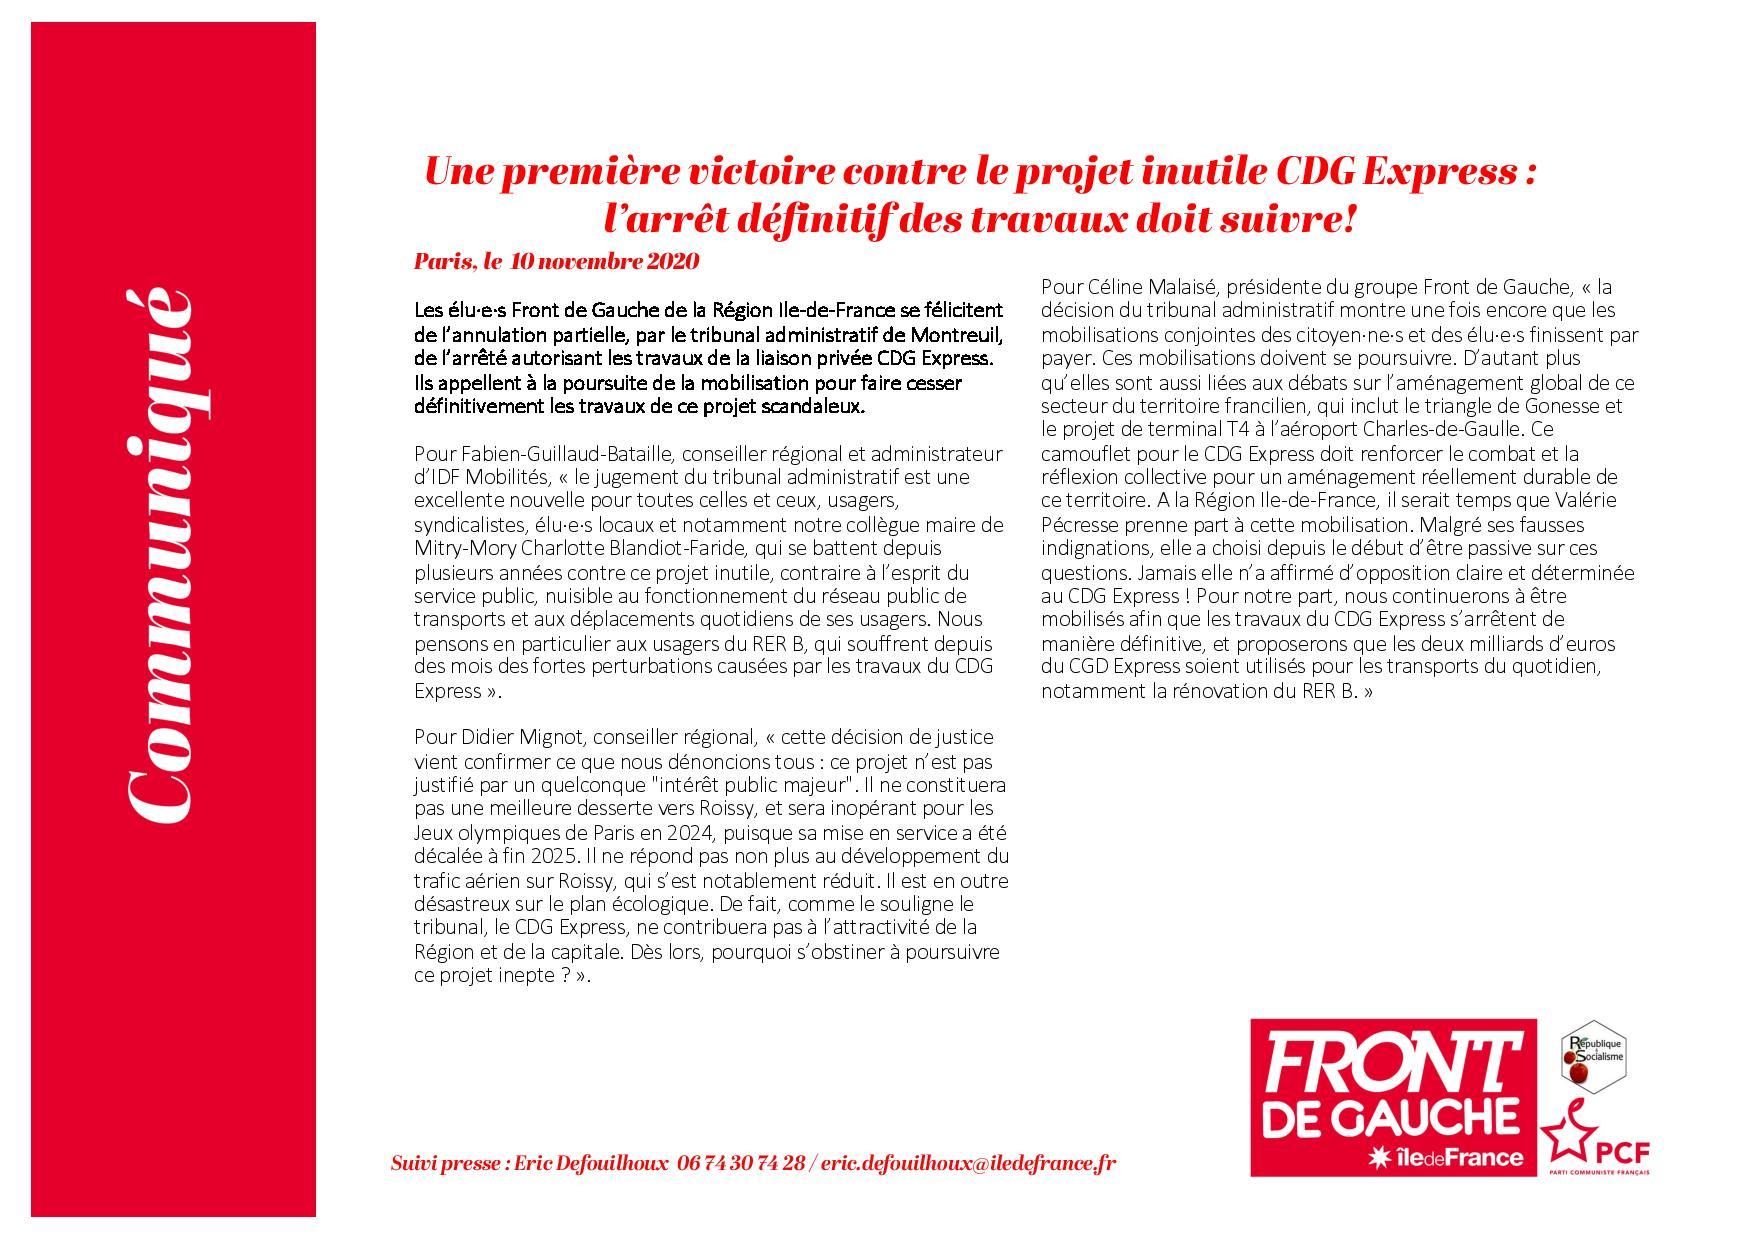 CP_FDG-Jugement_TA_CDG_express_-10nov20-page-001.jpg